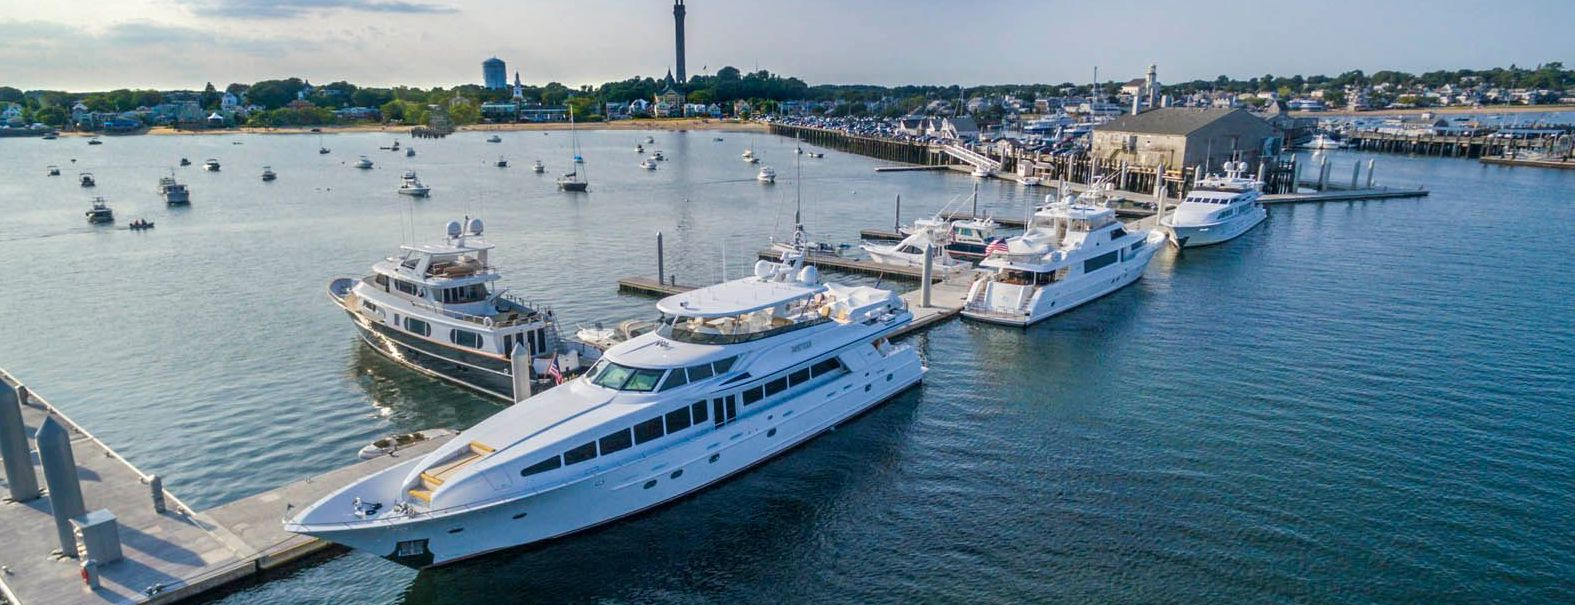 Provincetown Marina Yachts | Snag-A-Slip